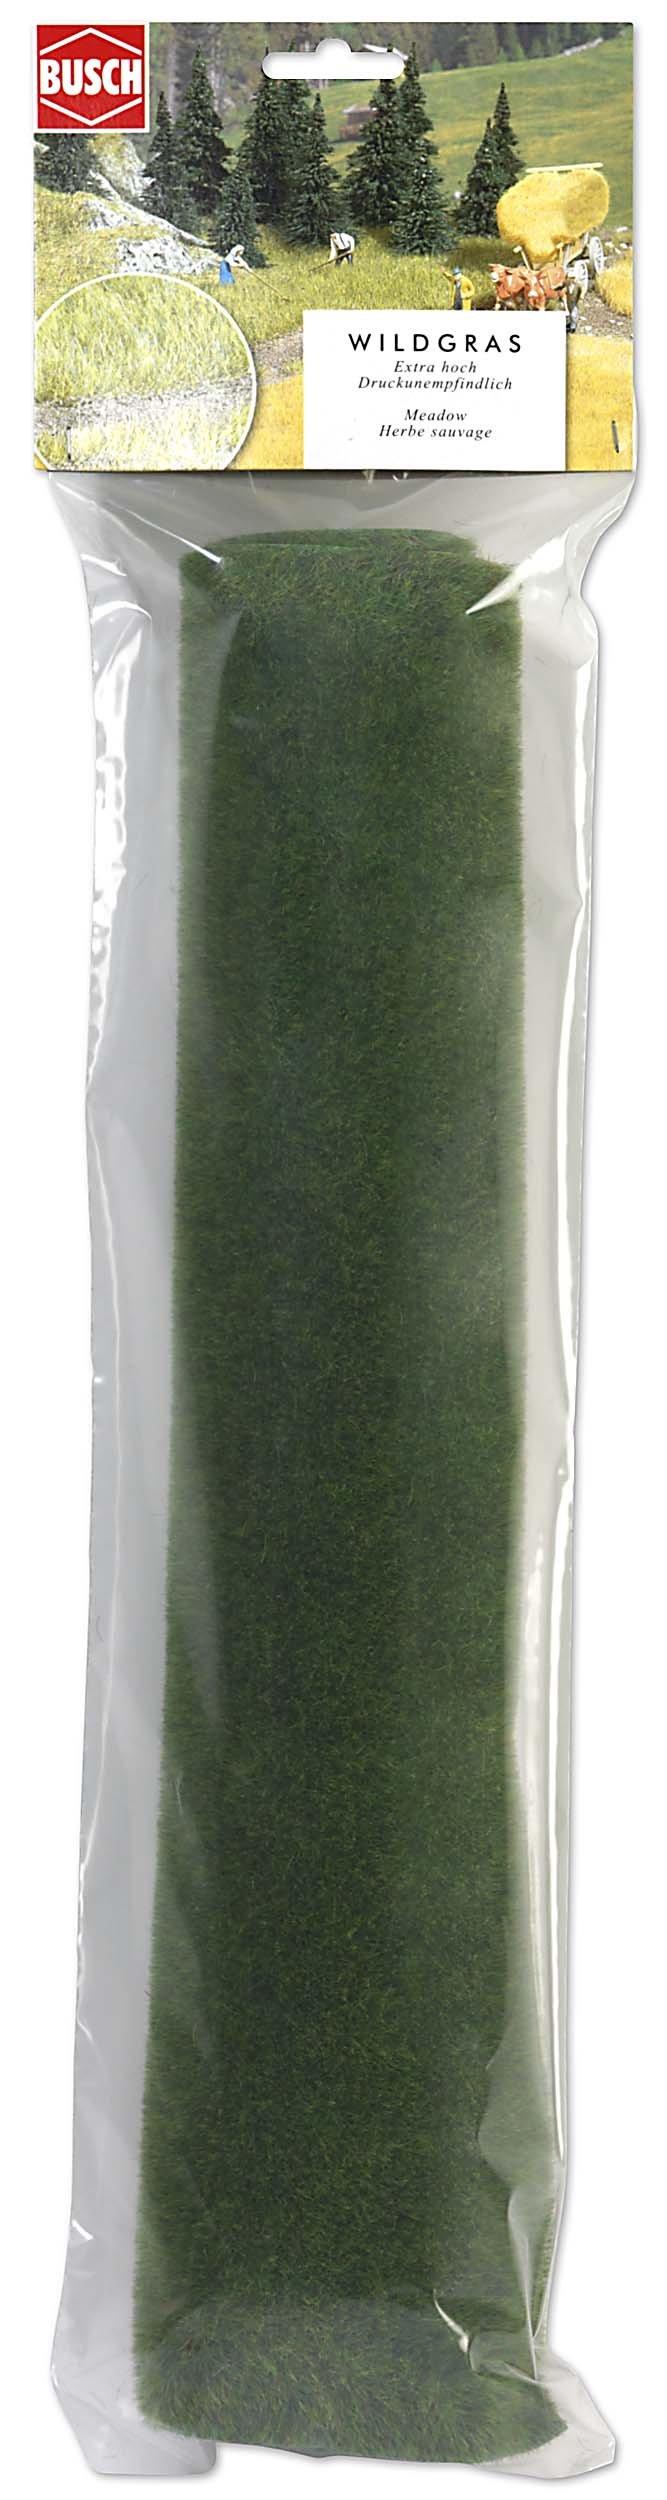 Busch 7210 Grass Matting Small Lt Green HO Scenery Scale Model Scenery